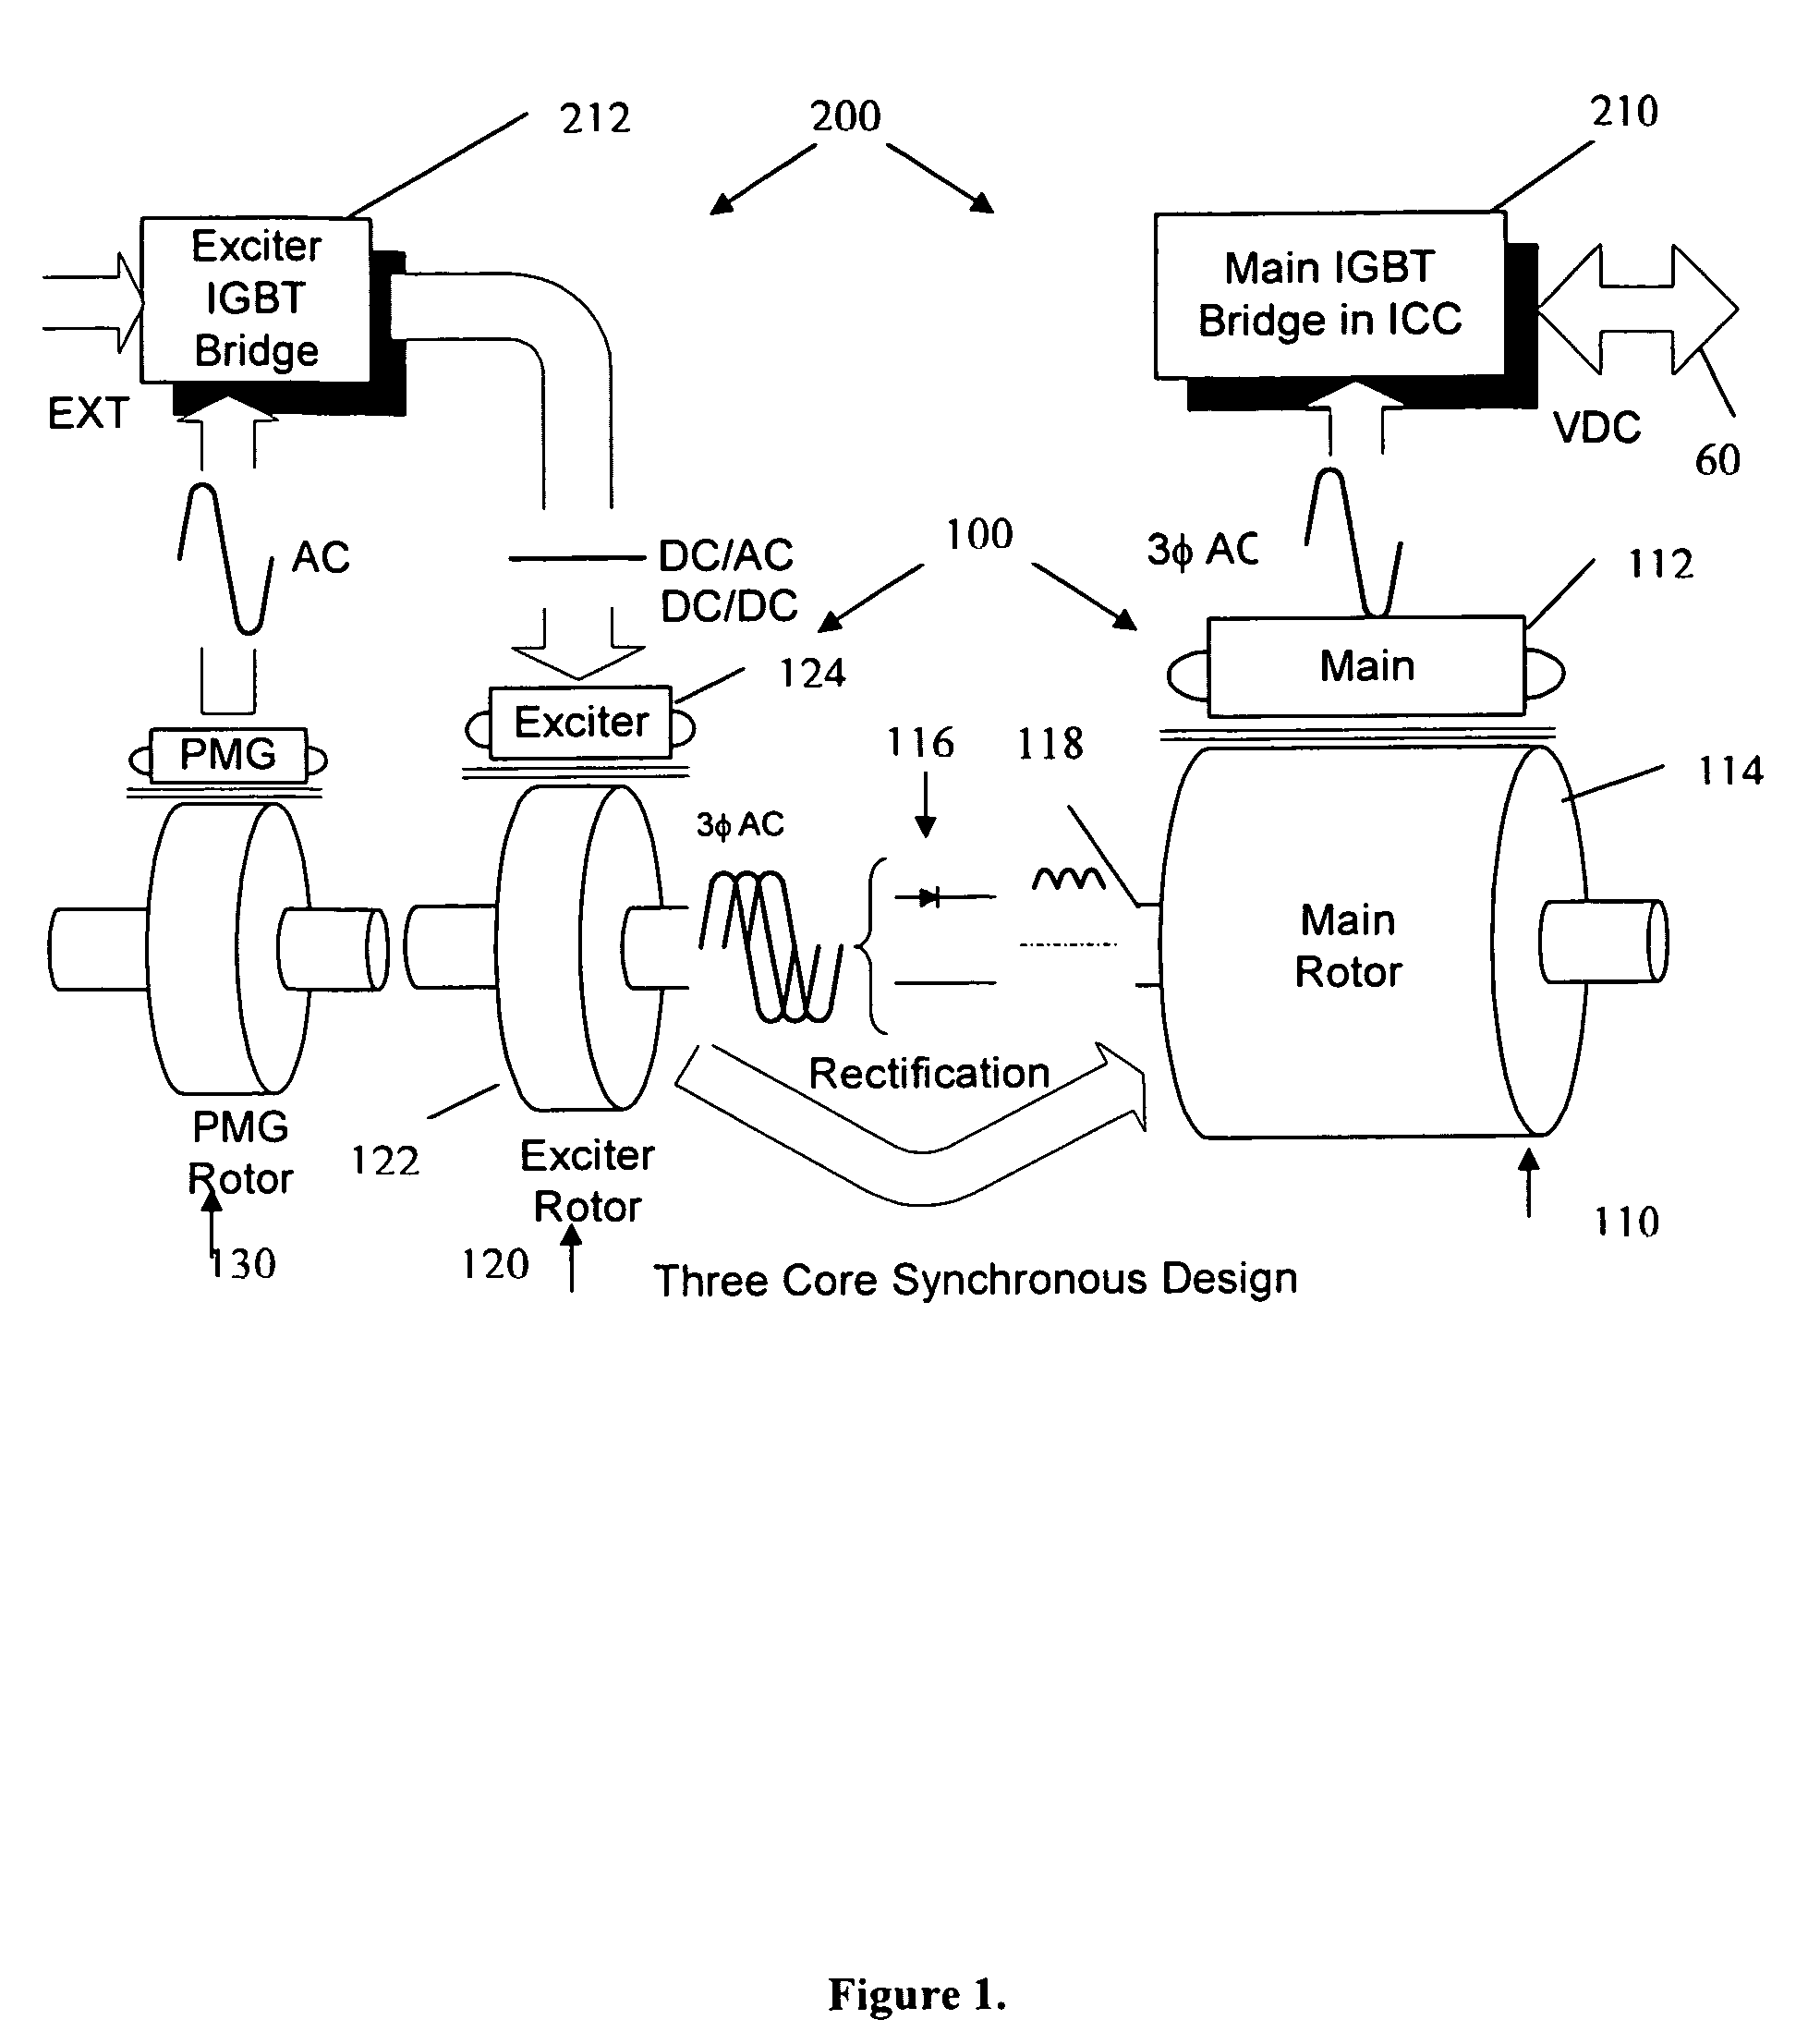 remote start wiring diagrams for generators wiring diagrams for aircraft generators